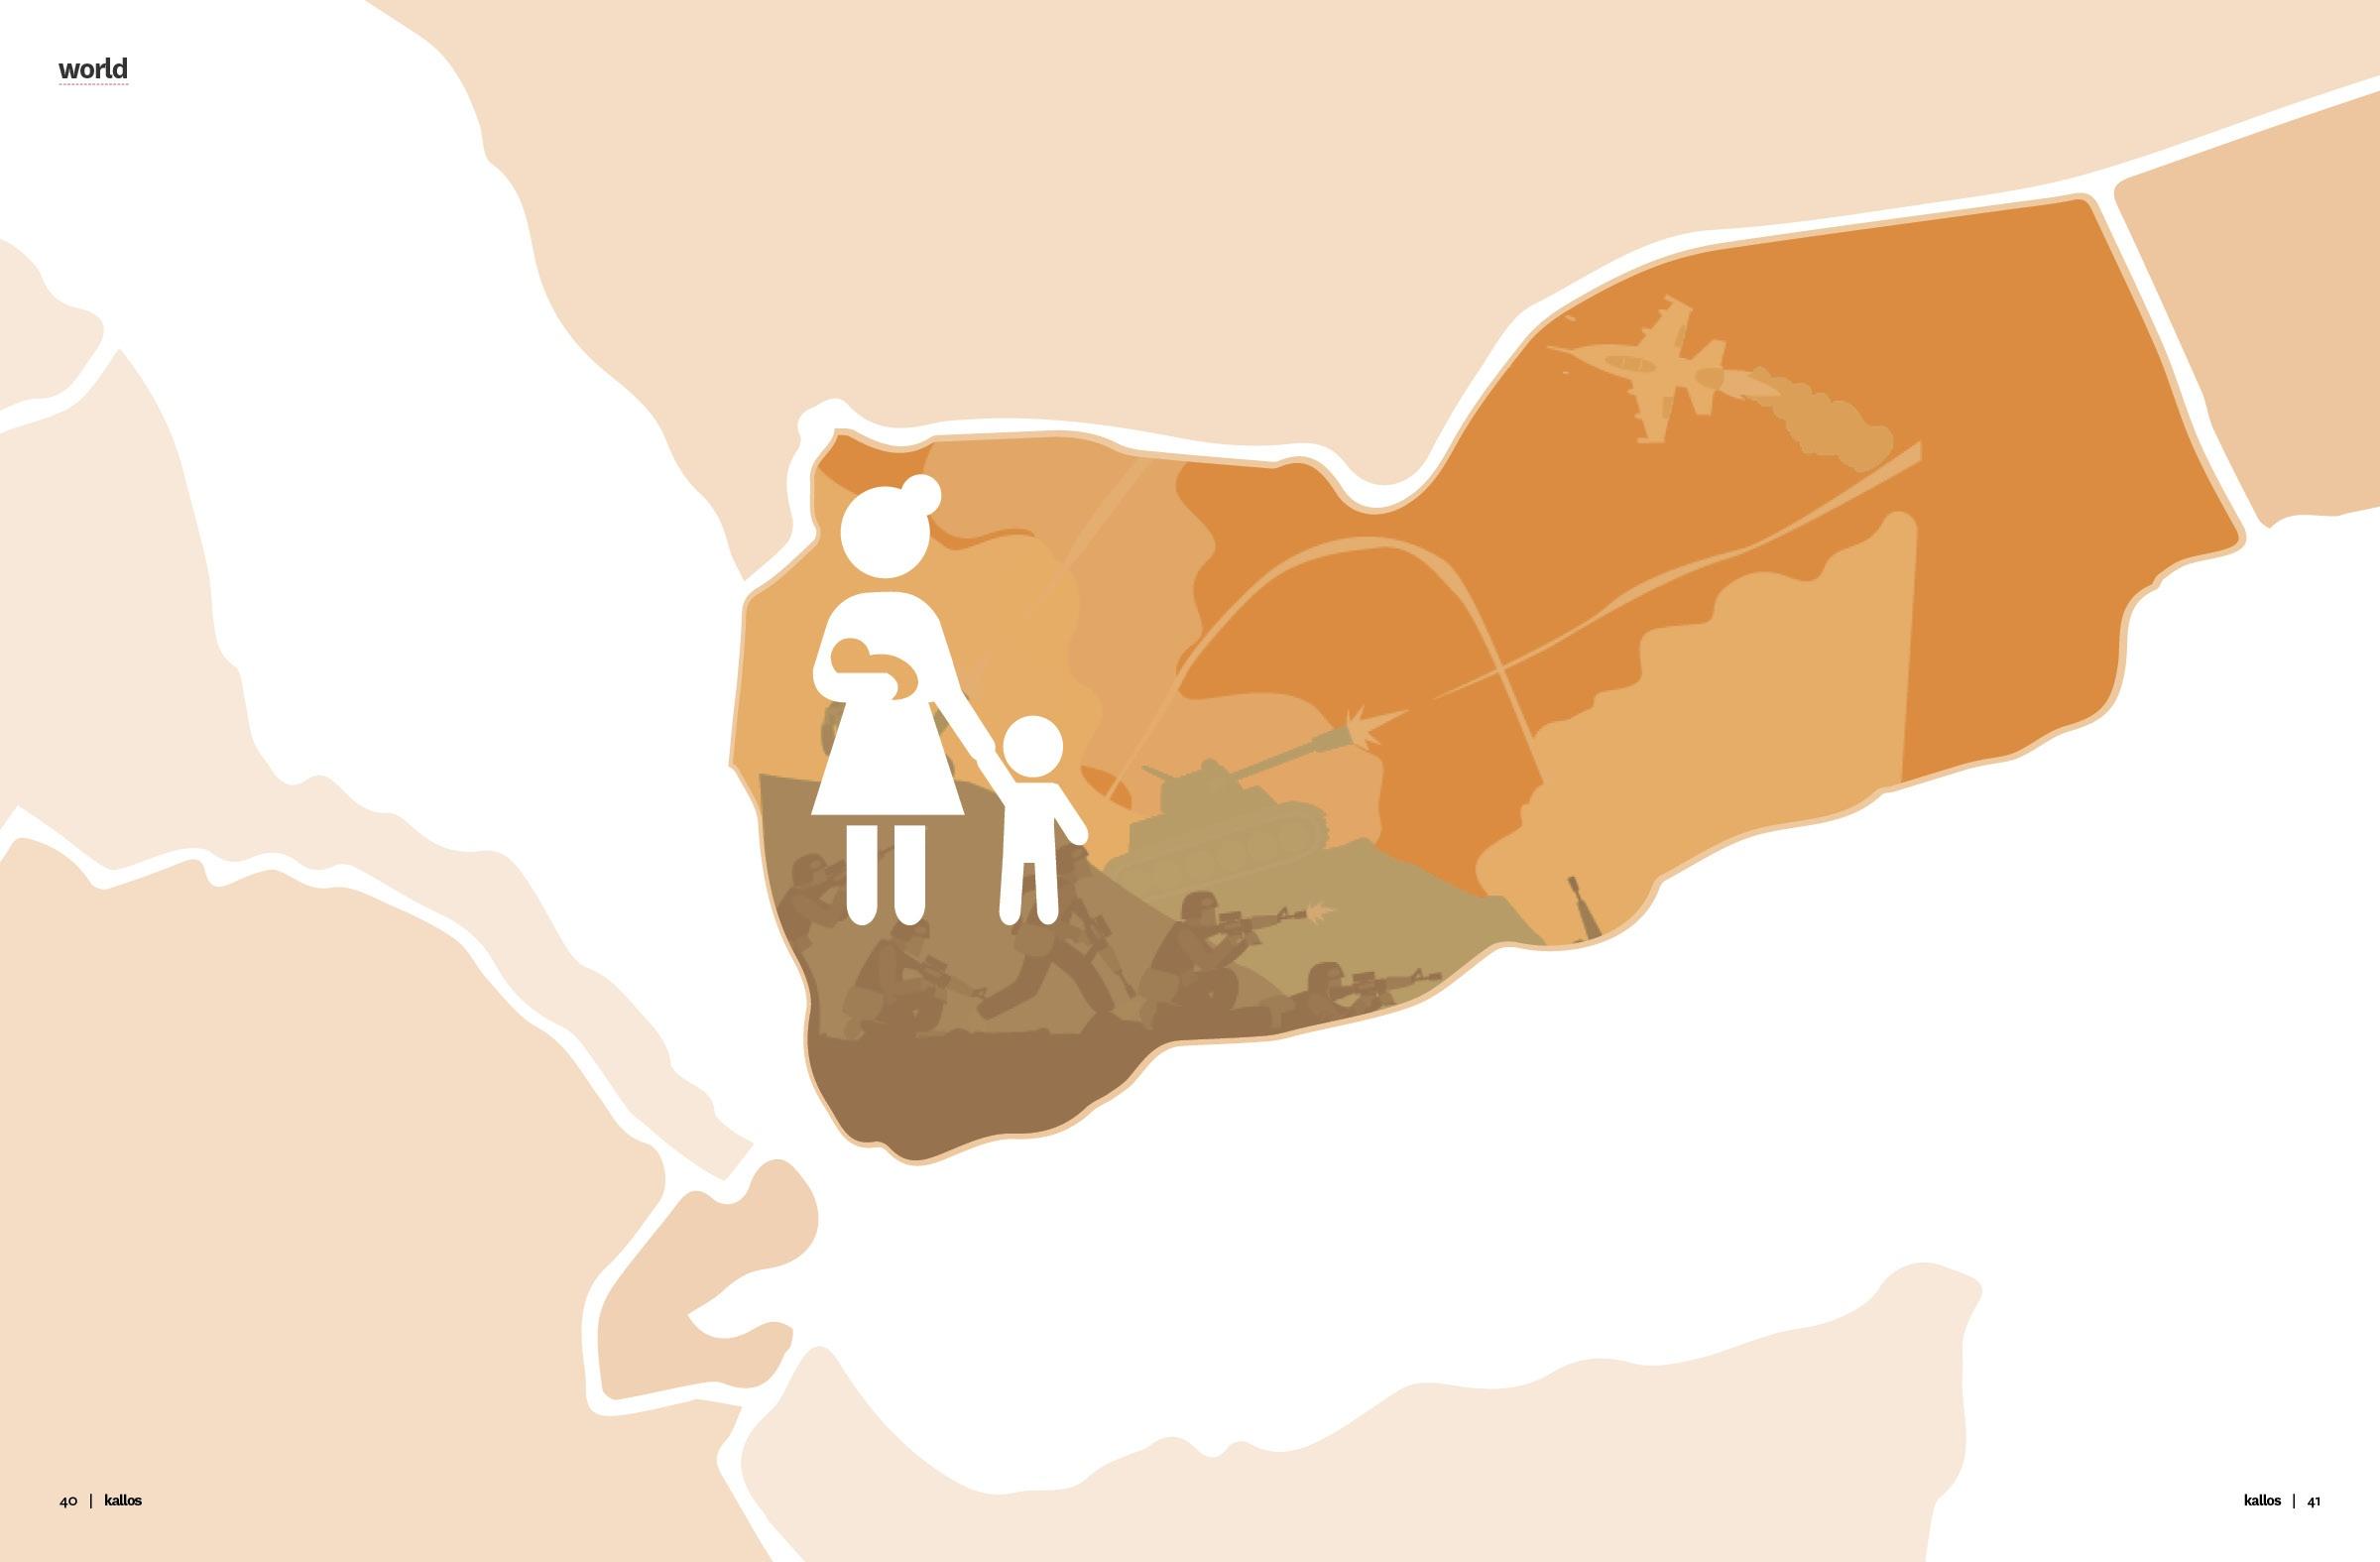 The Yemen War